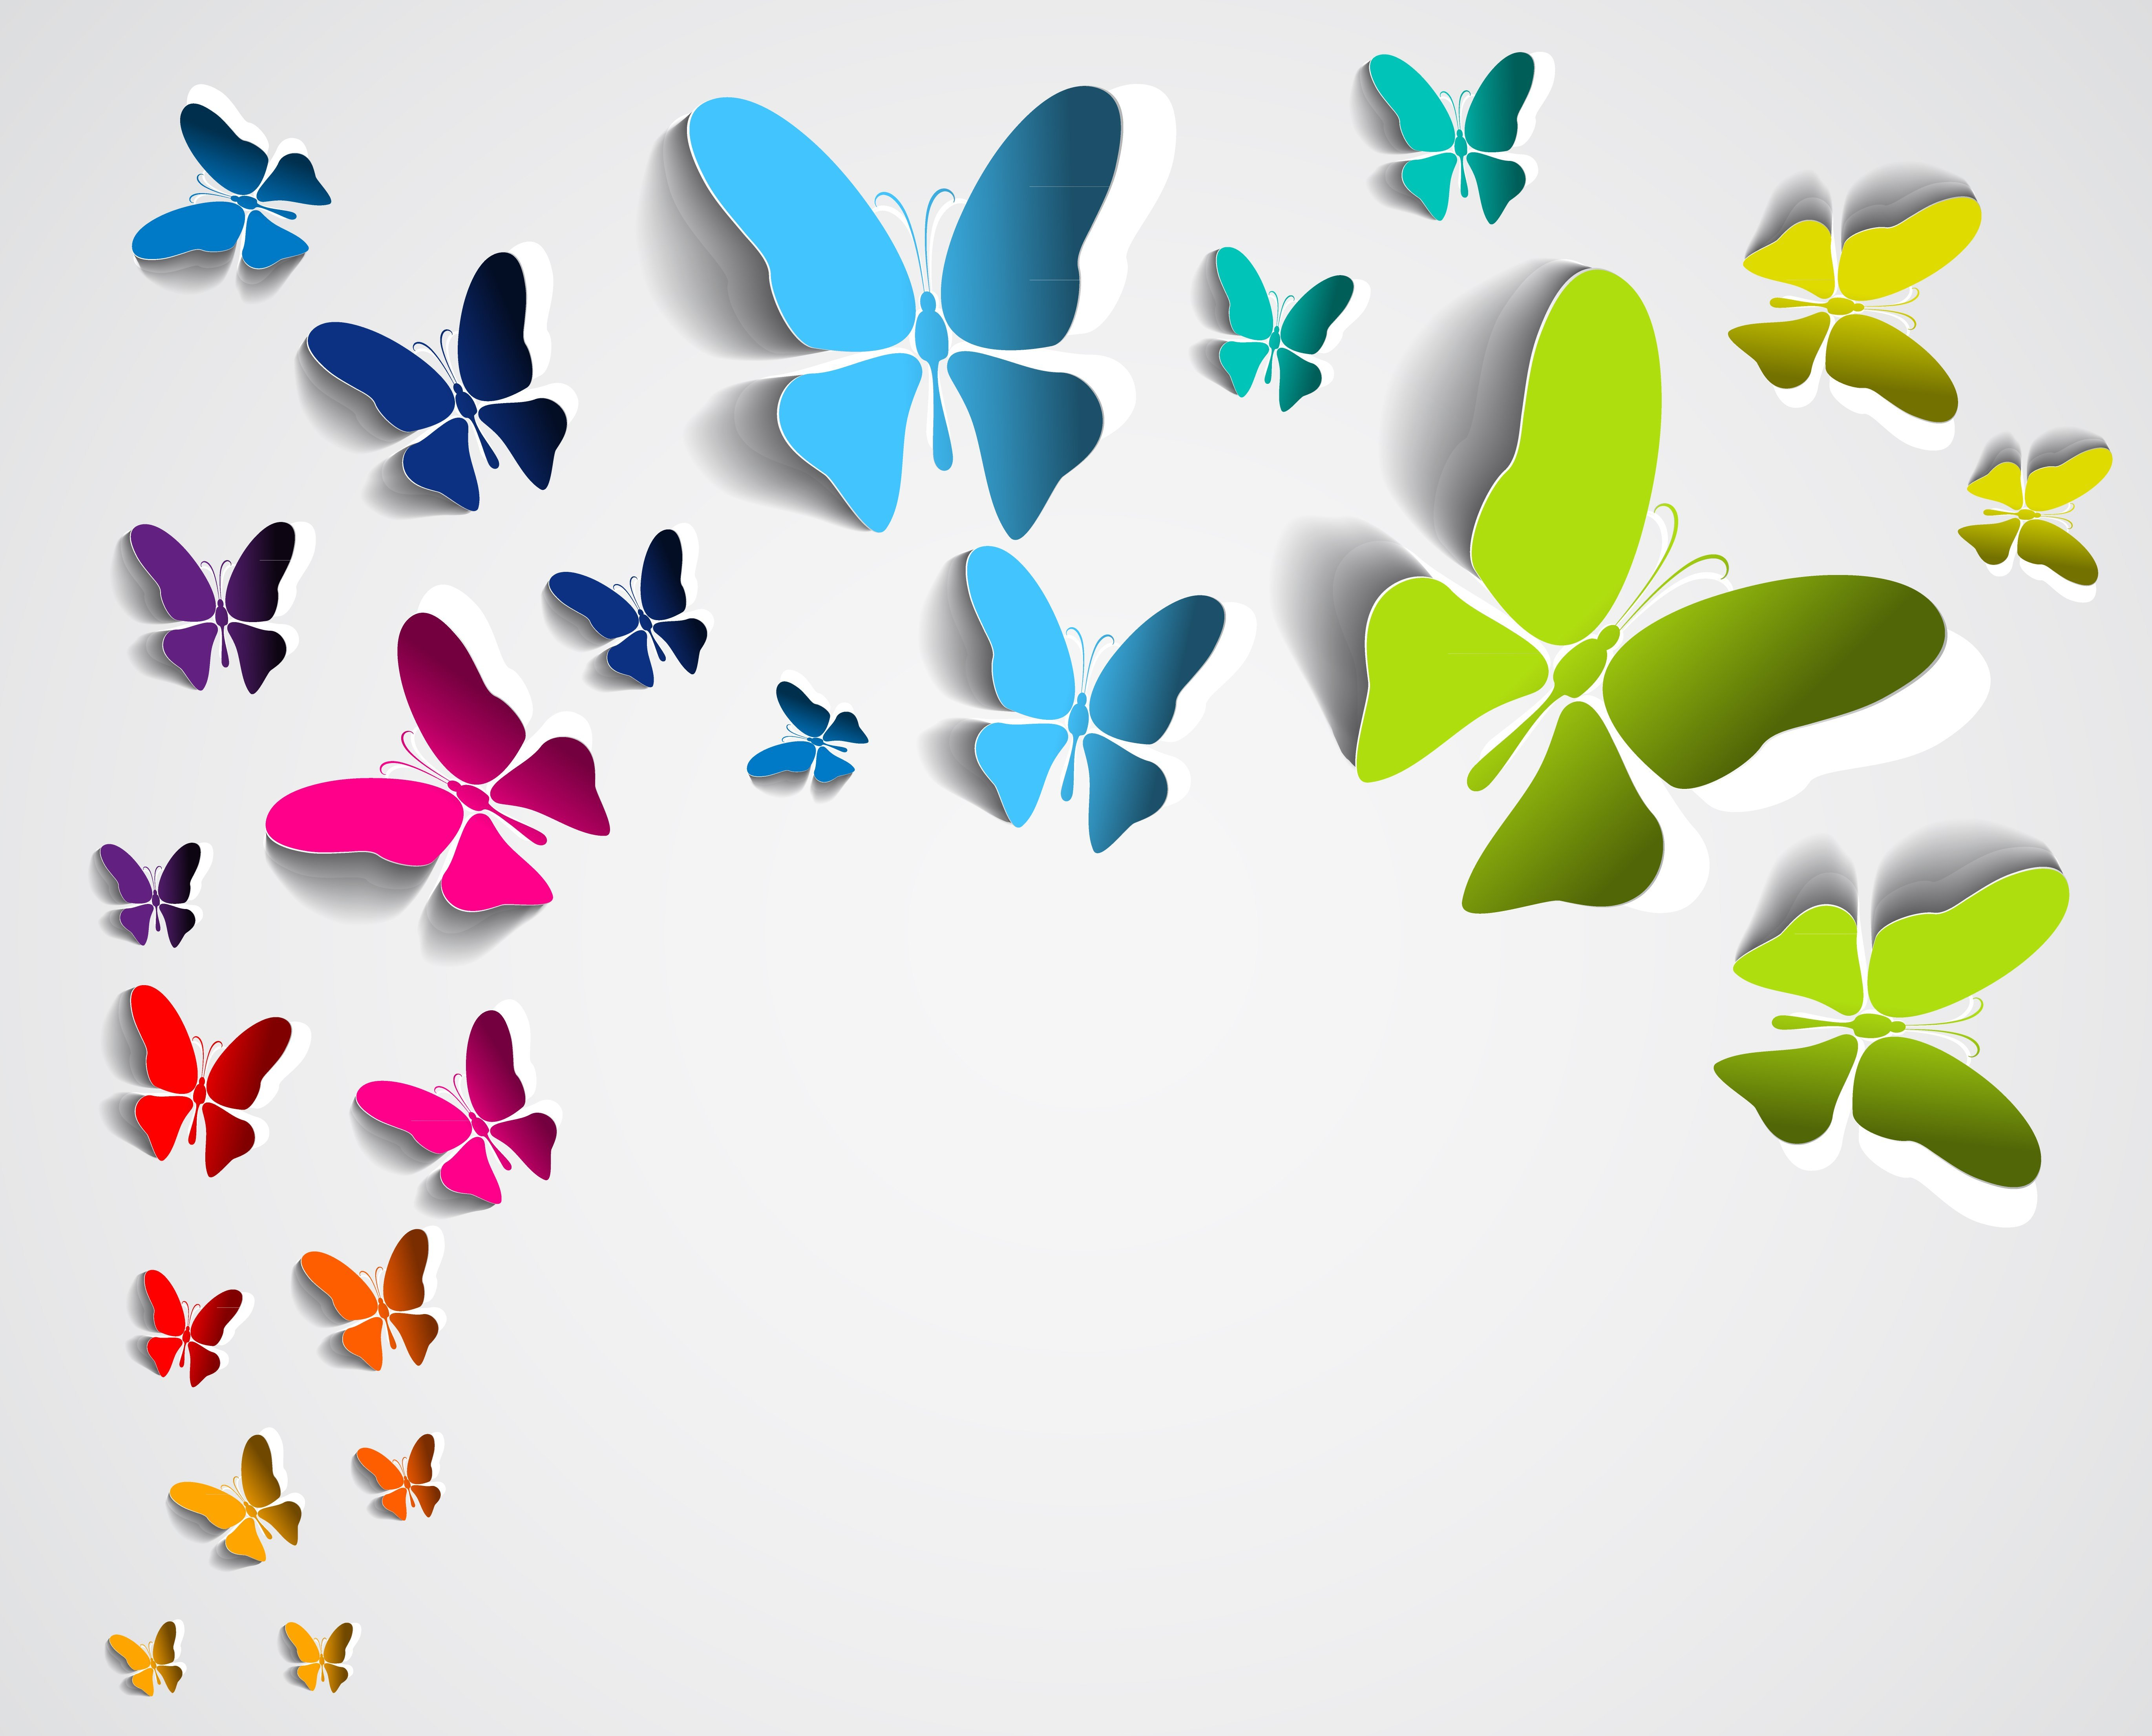 Бабочки картинки для открытки, приглашения екатеринбург открытка